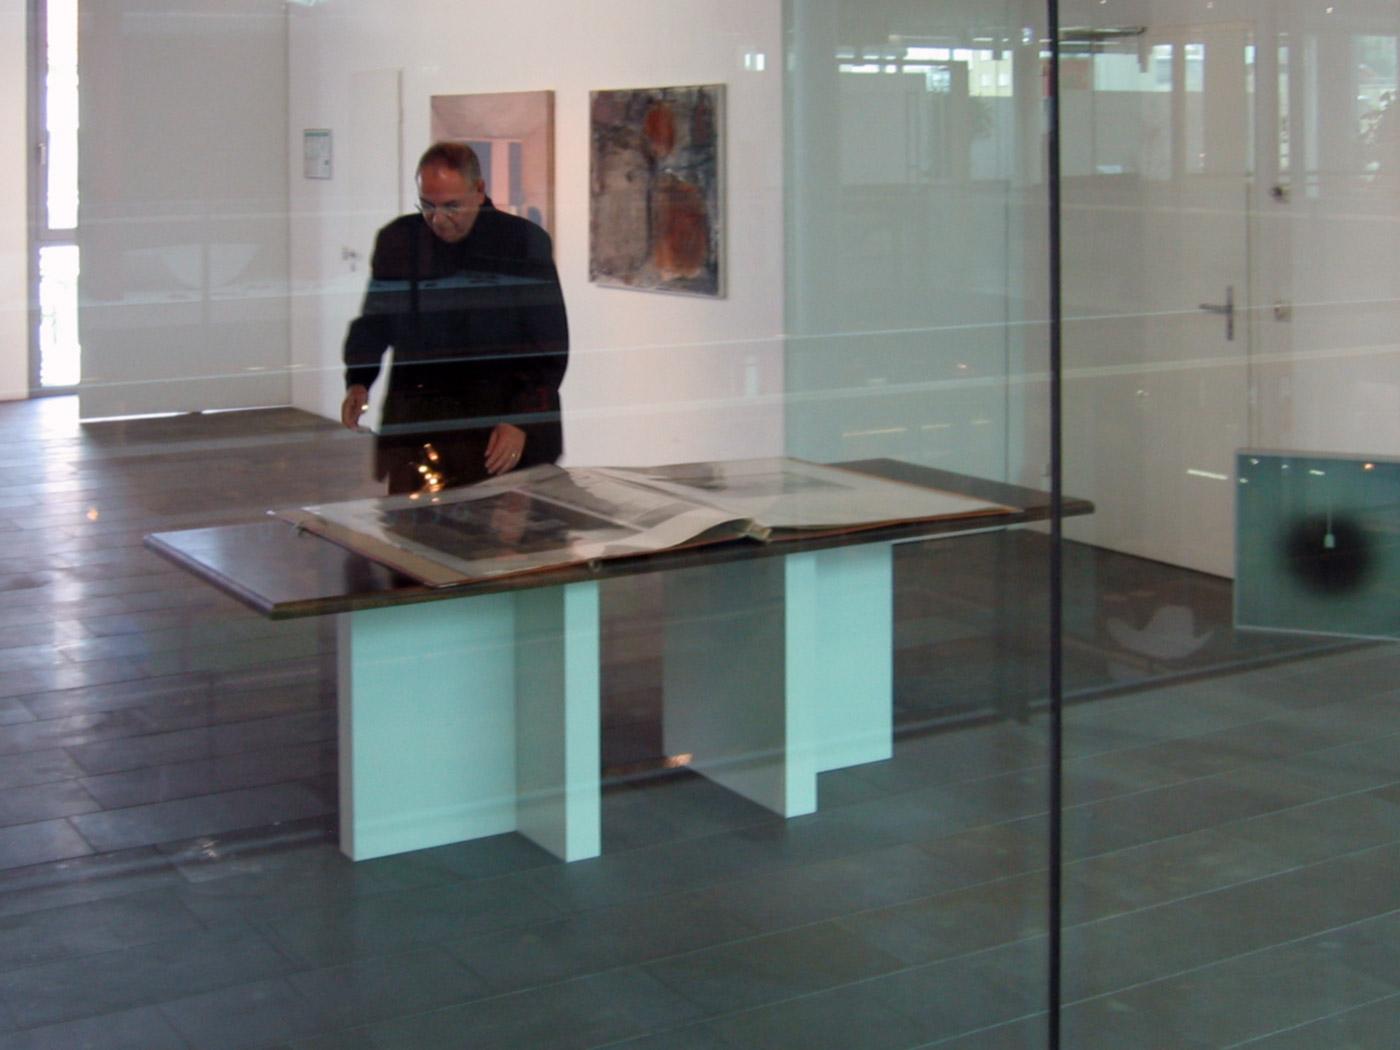 TABLE © 2004, plywood, 200 x 100 x 75 cm